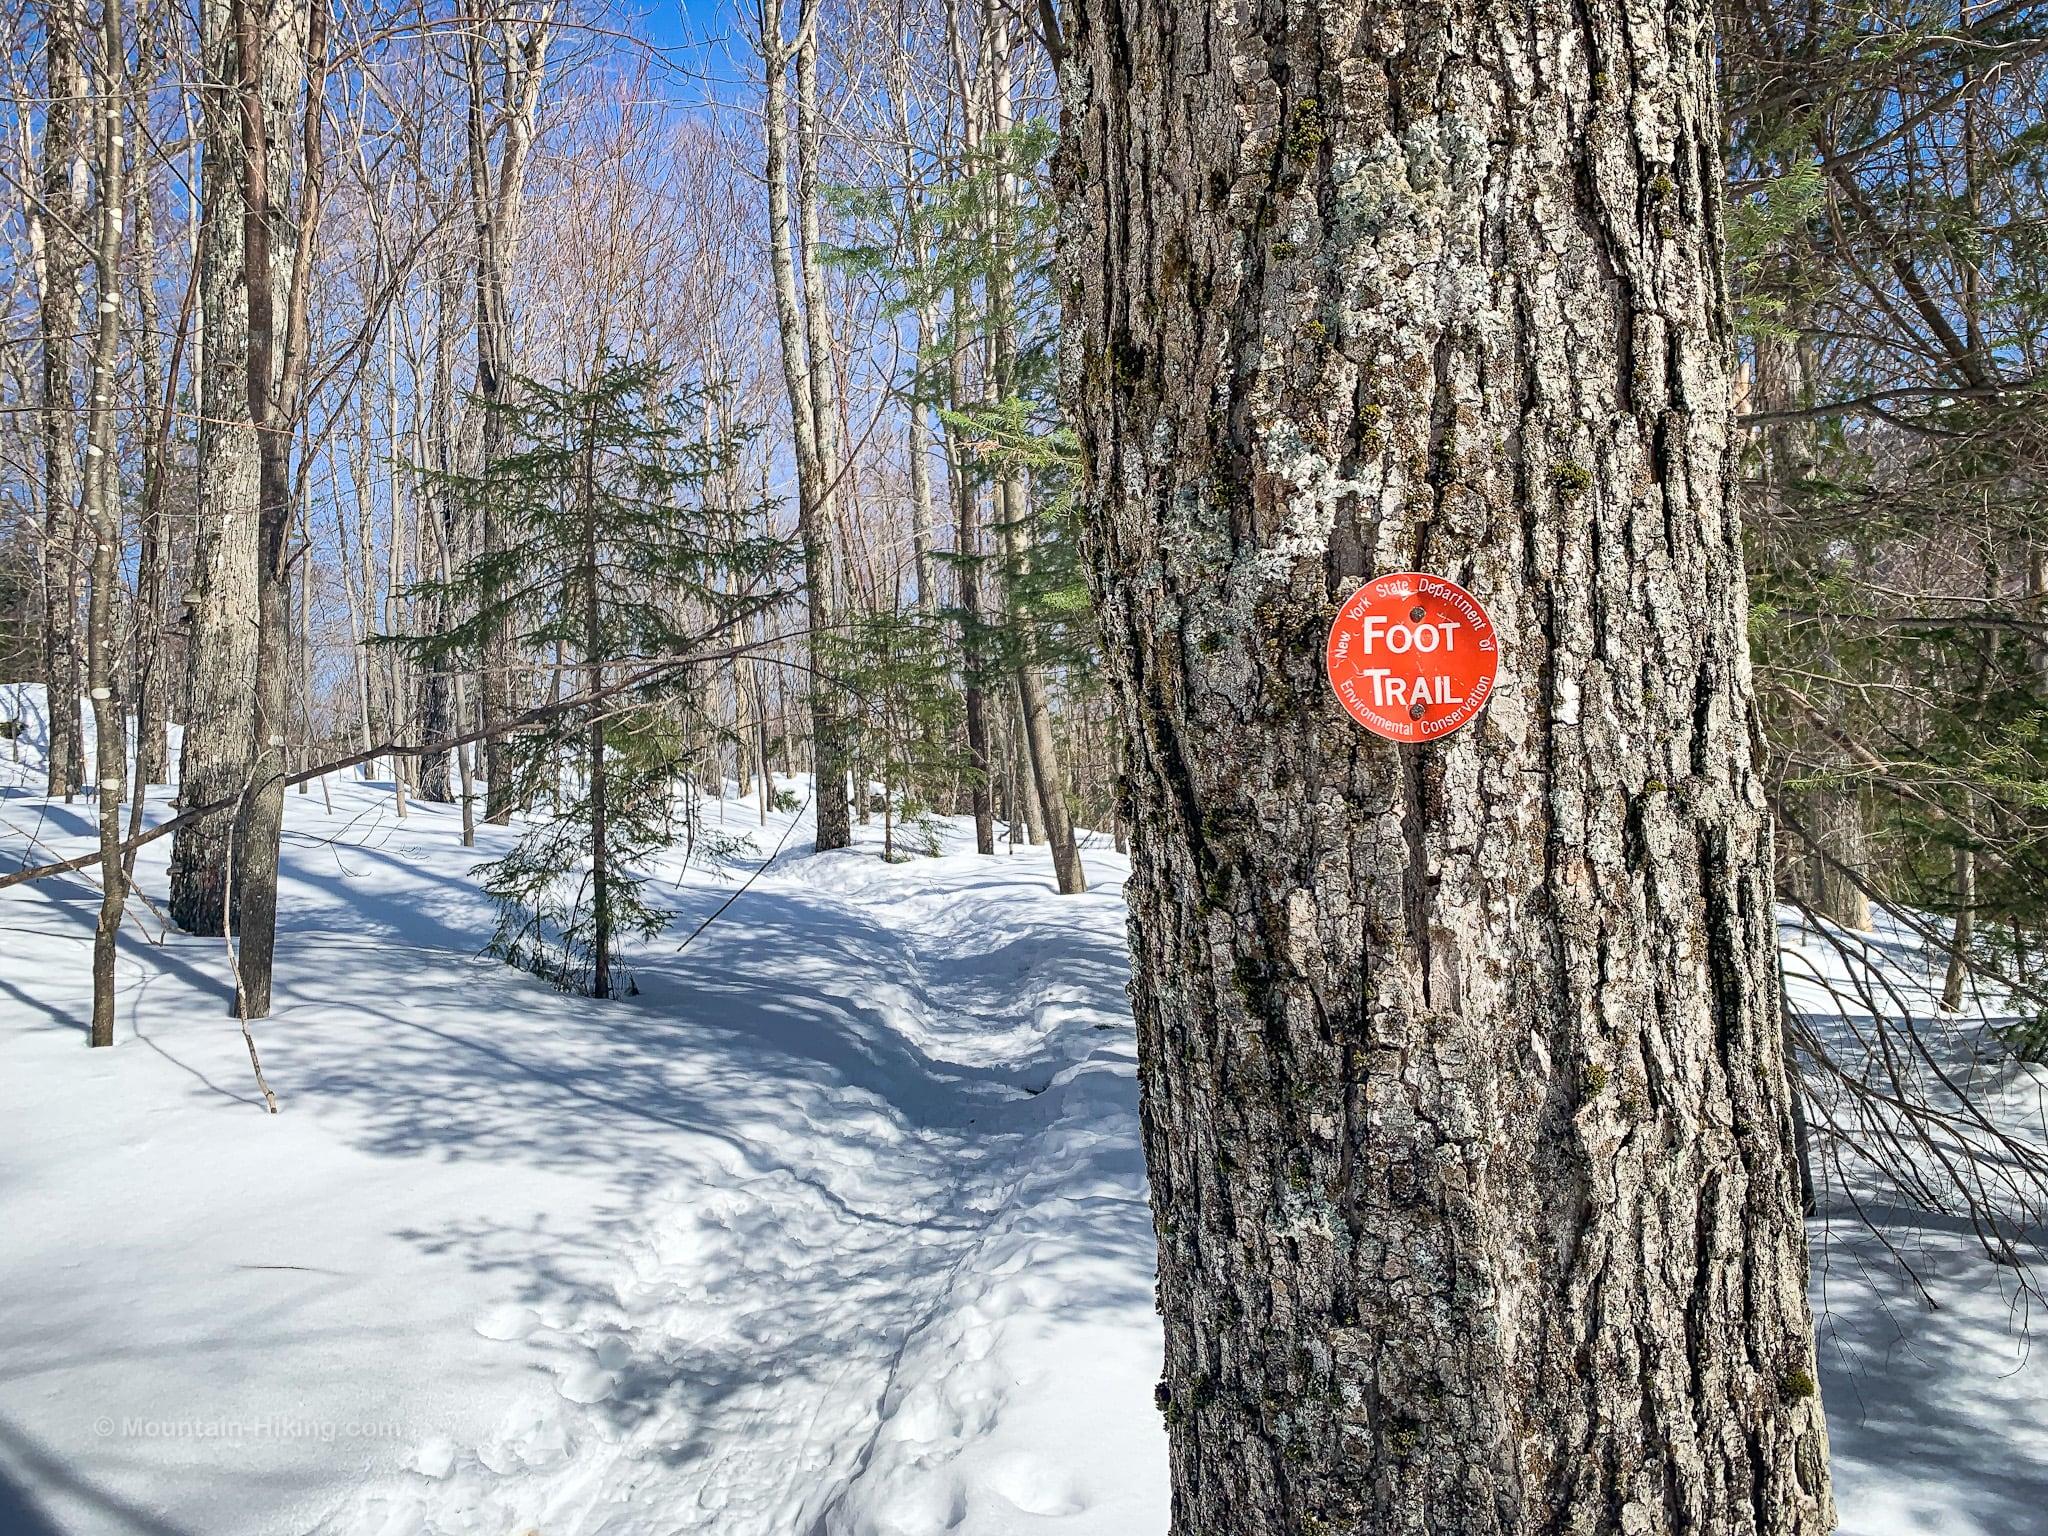 trail blaze on tree trunks